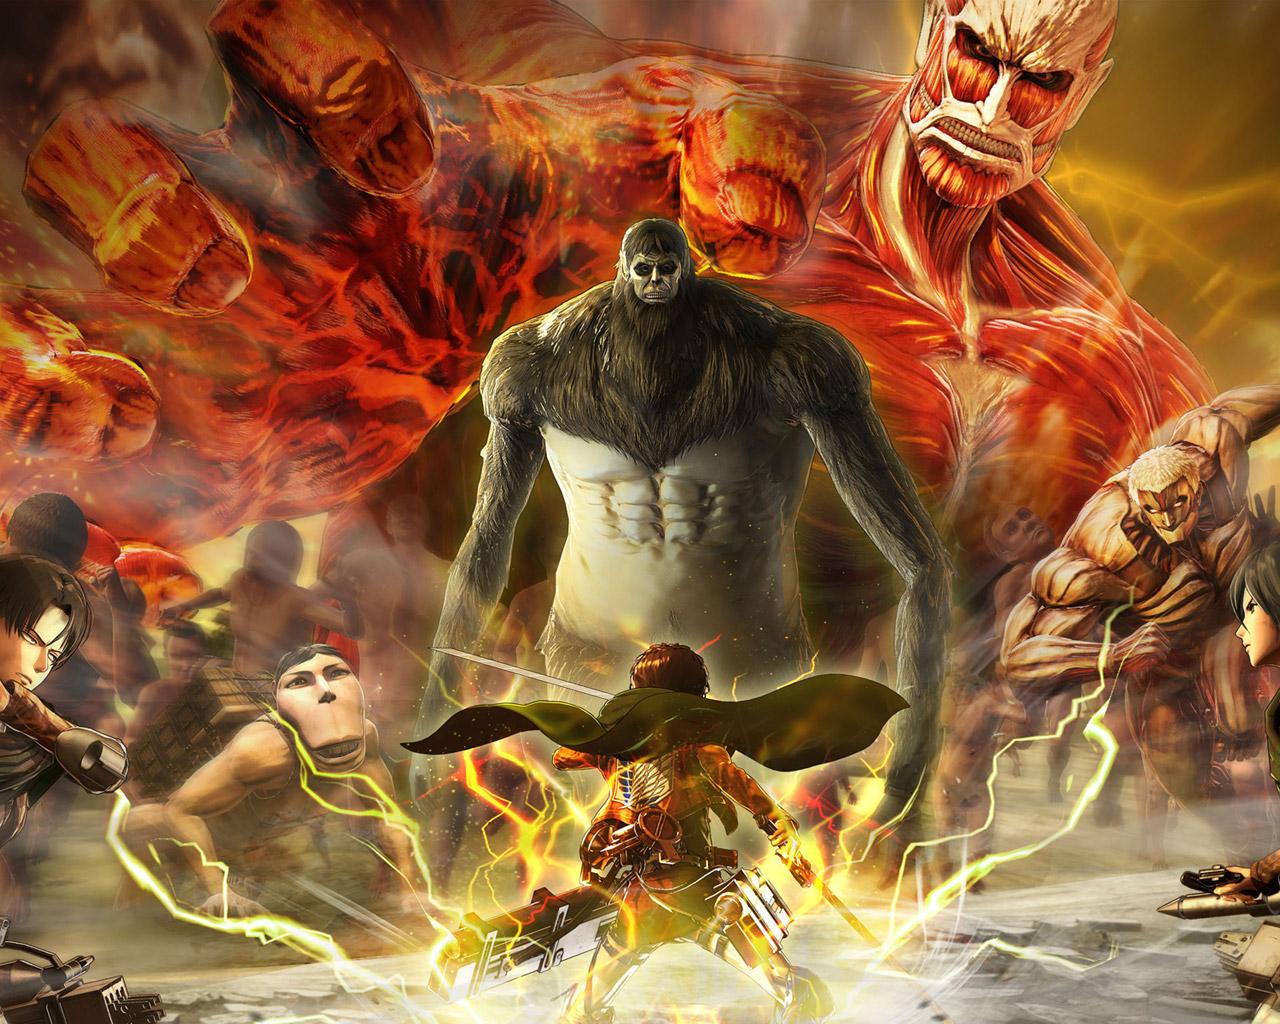 Free Attack on Titan 2 Wallpaper in 1280x1024